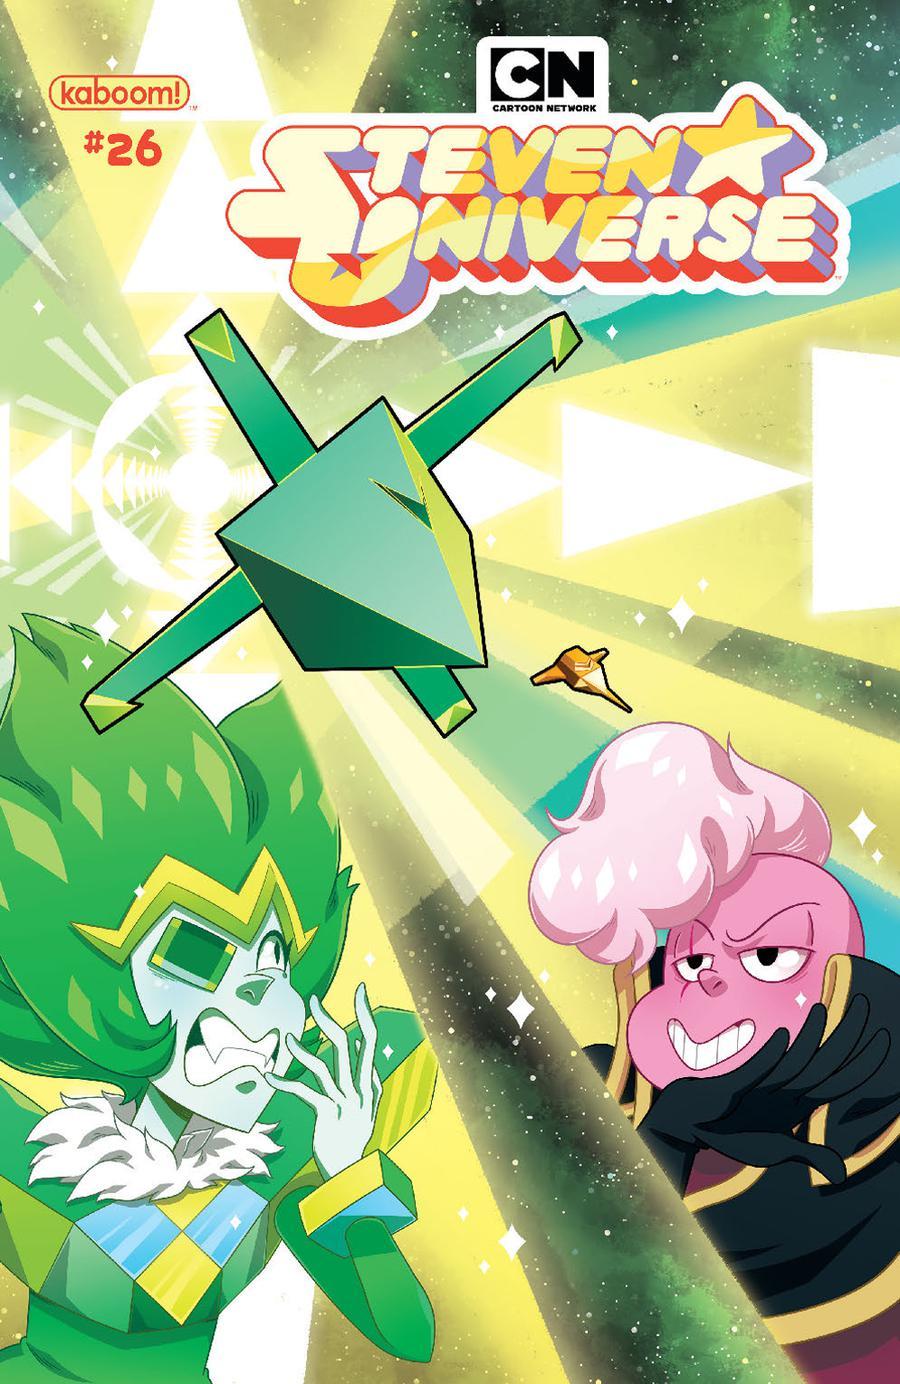 Steven Universe Vol 2 #26 Cover A Regular Missy Pena Cover